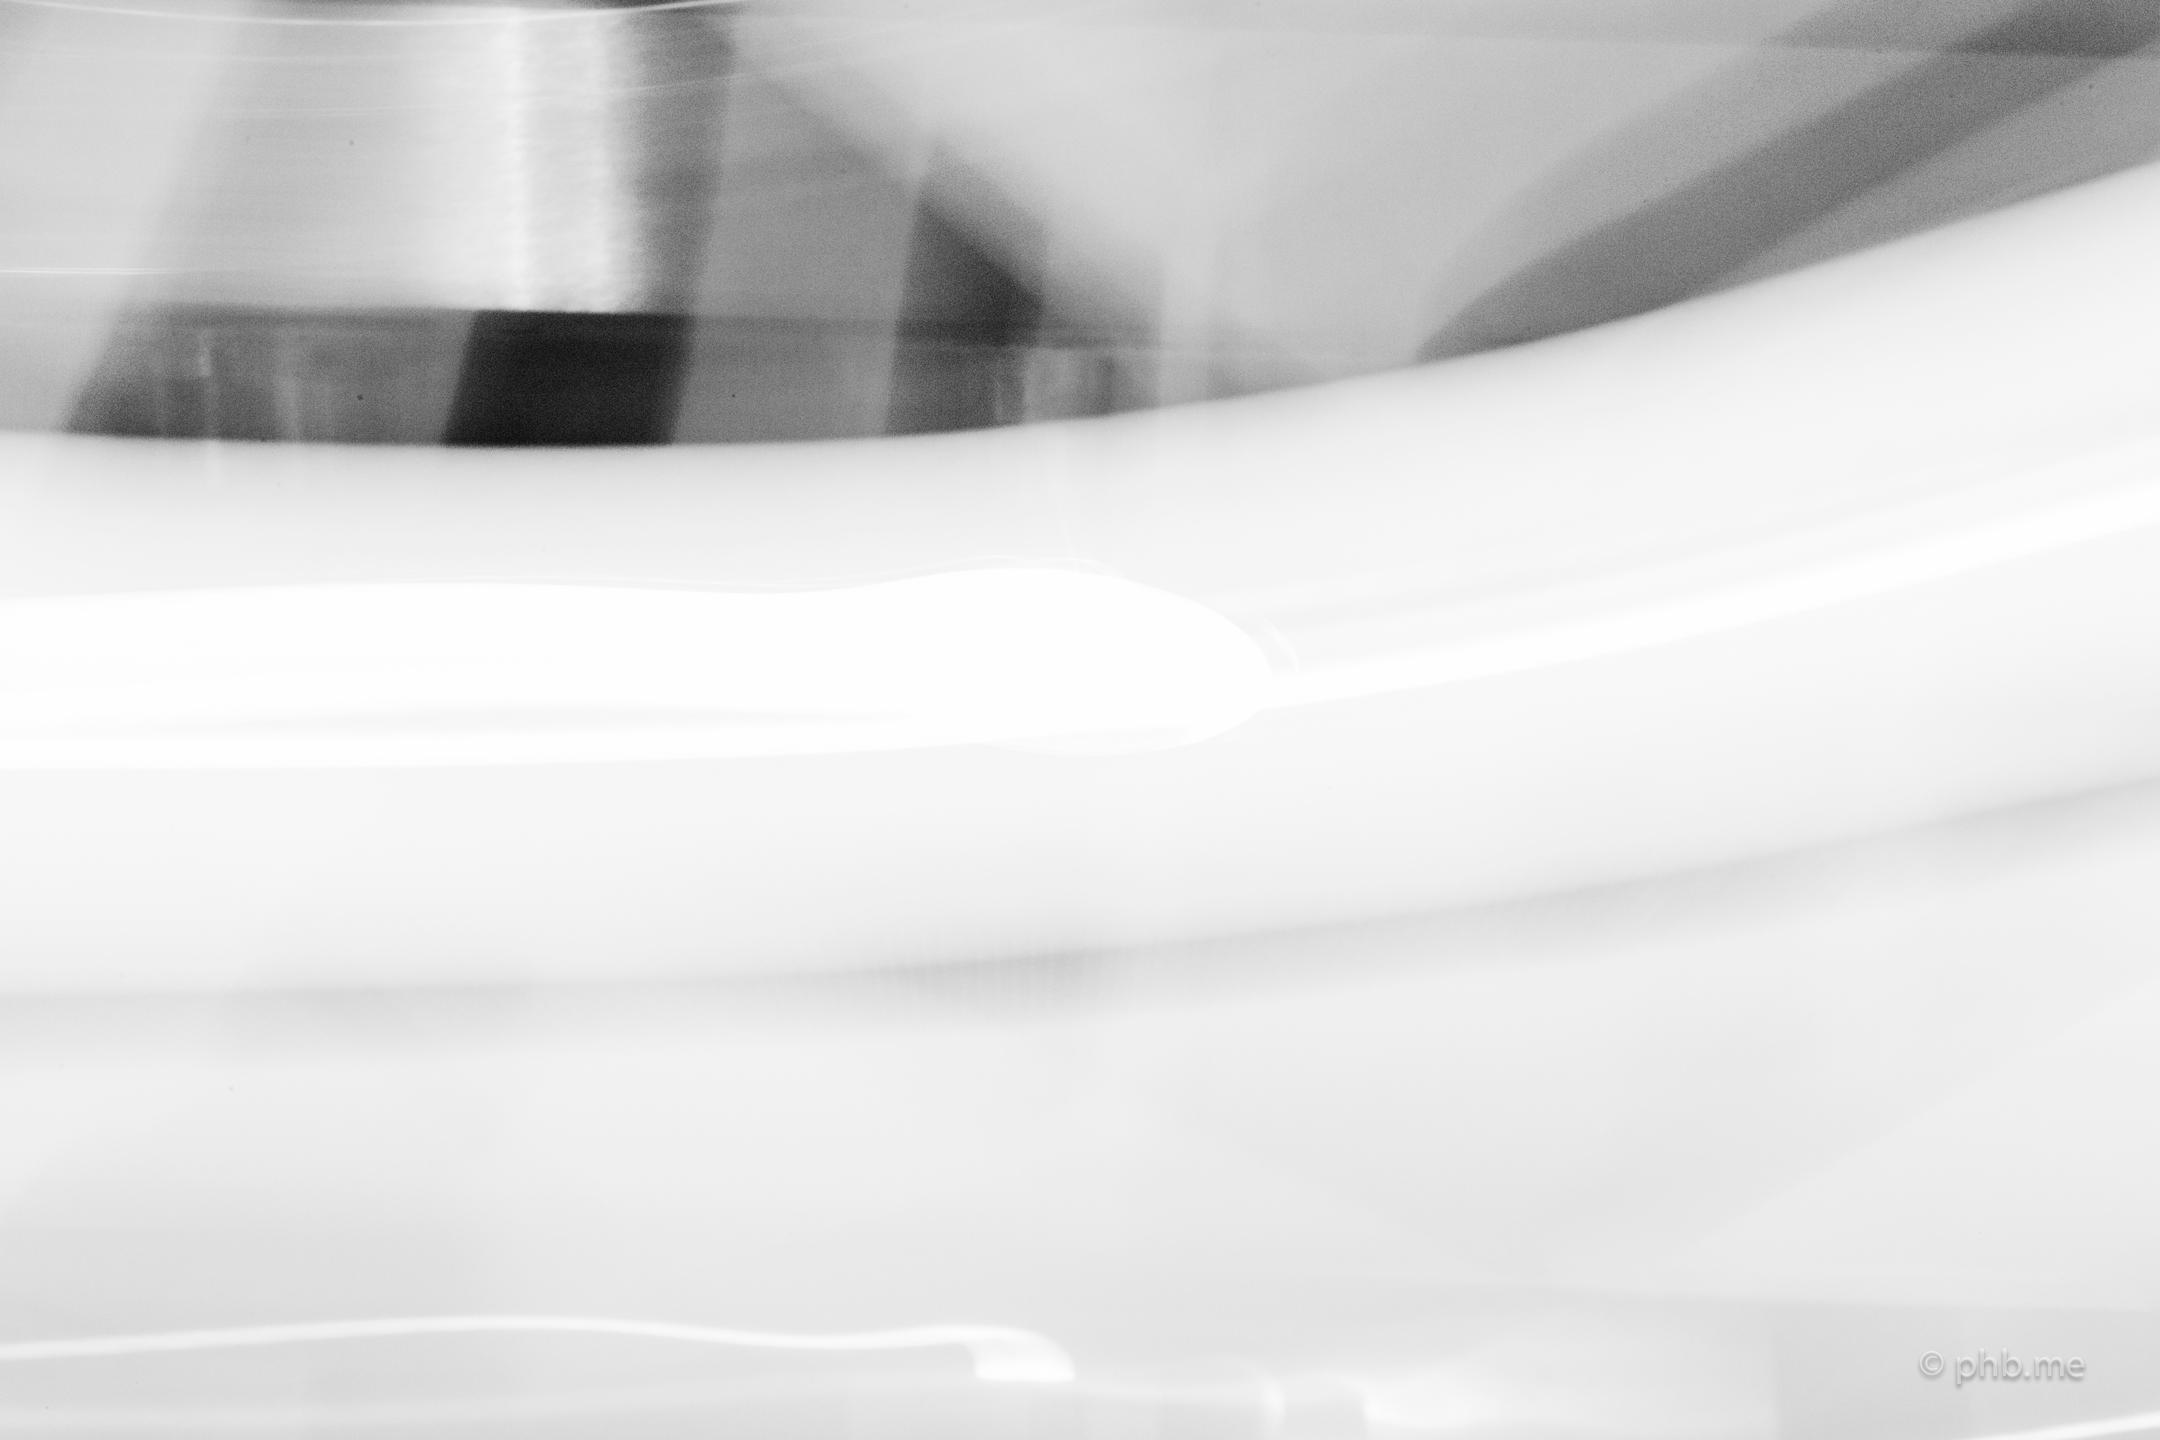 img_0103-phb-me-nb-huchot-2014